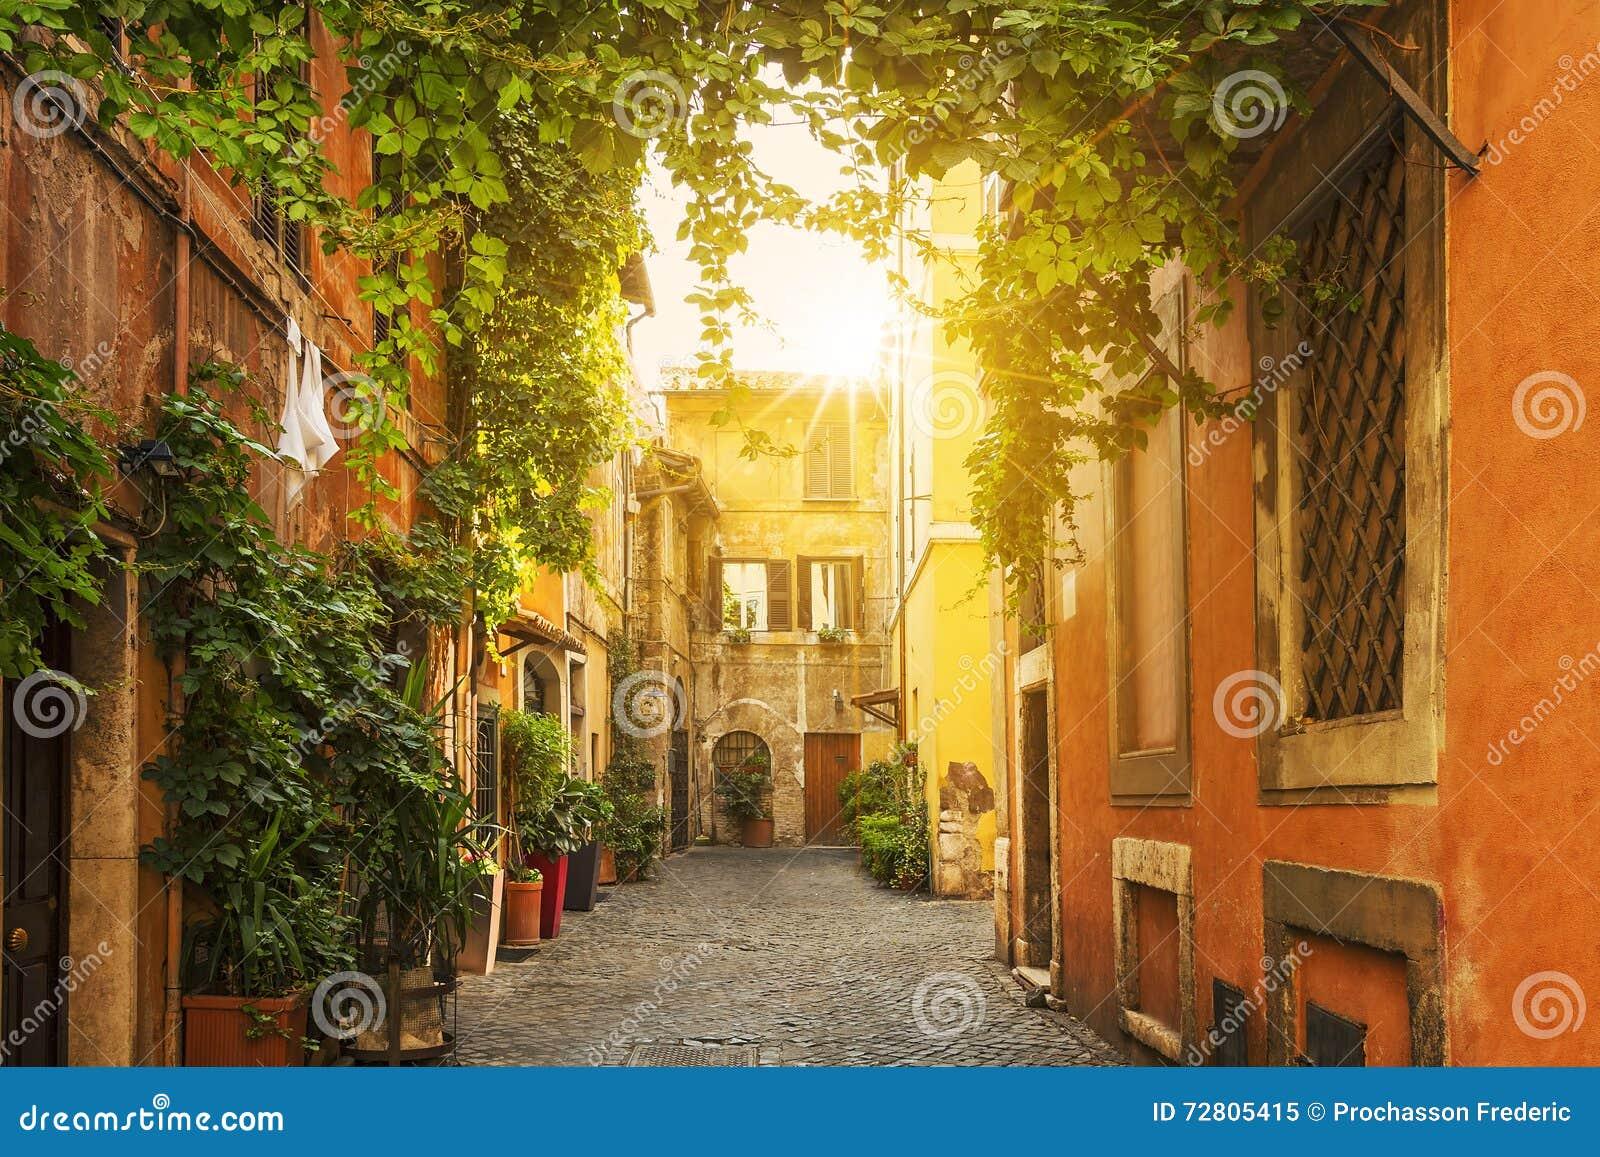 Download Old Street In Trastevere In Rome Stock Image - Image of city, italian: 72805415